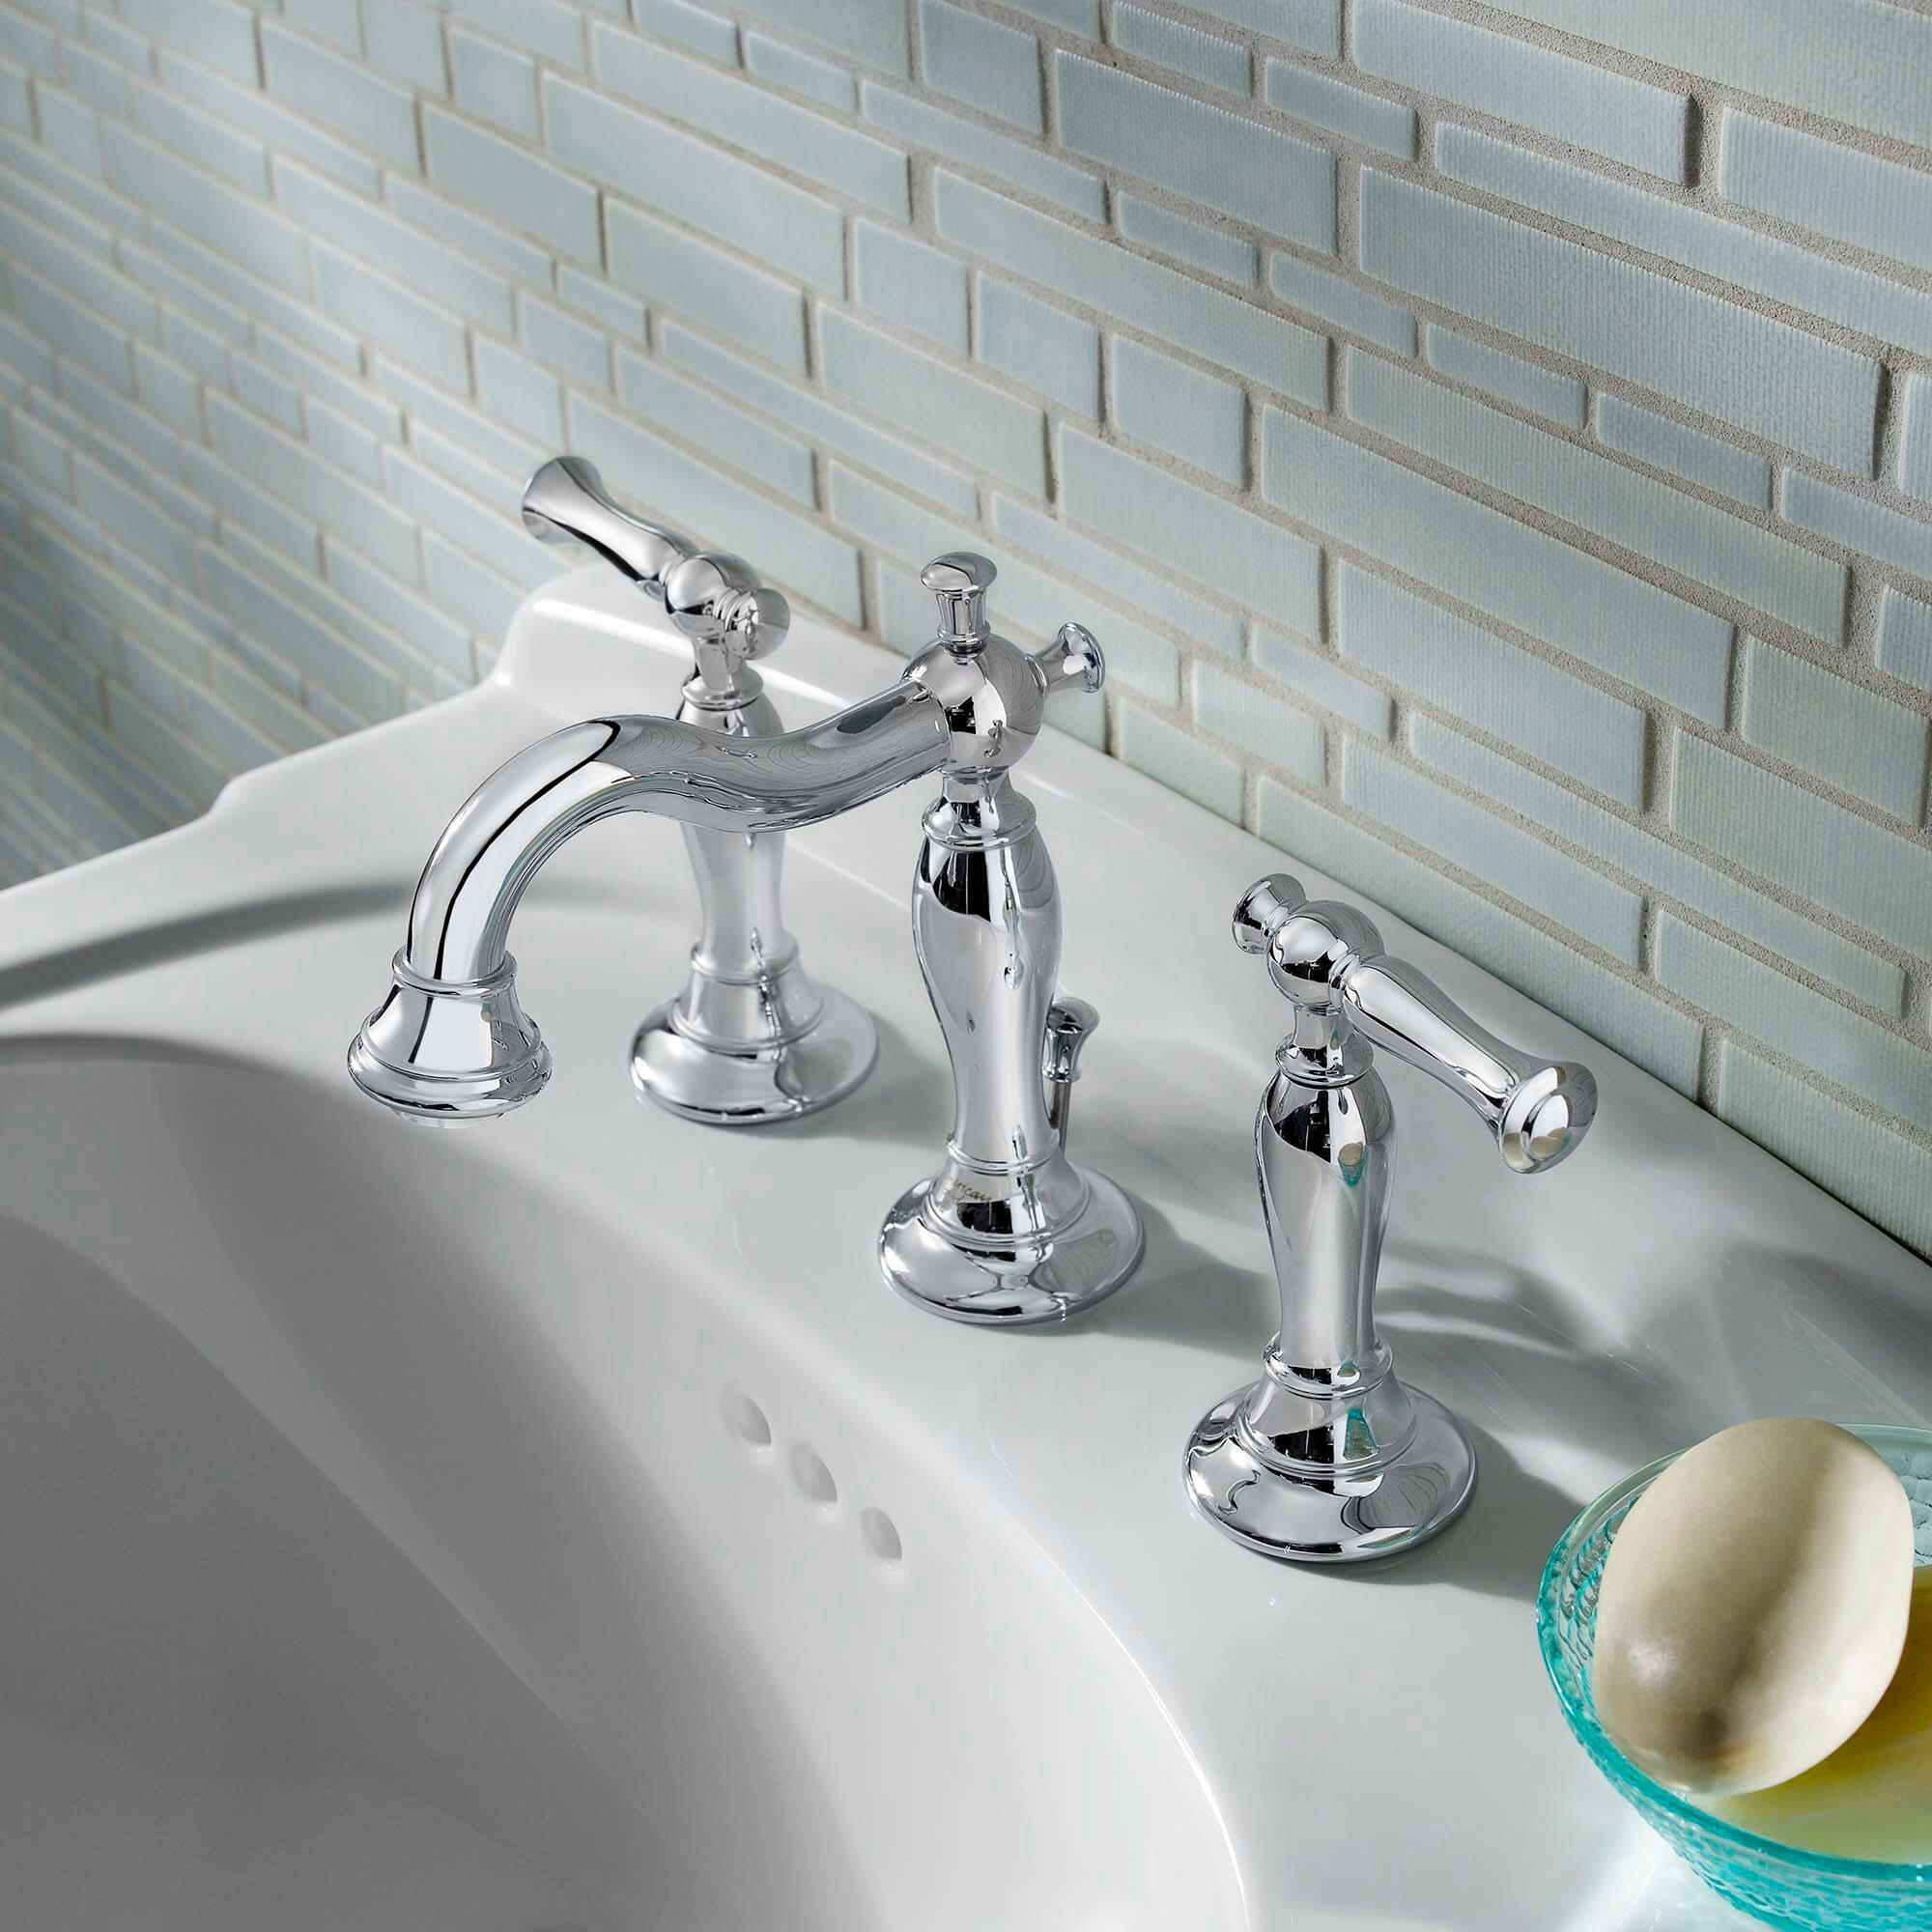 American Standard Quentin Widespread Bathroom Faucet & Reviews | Wayfair